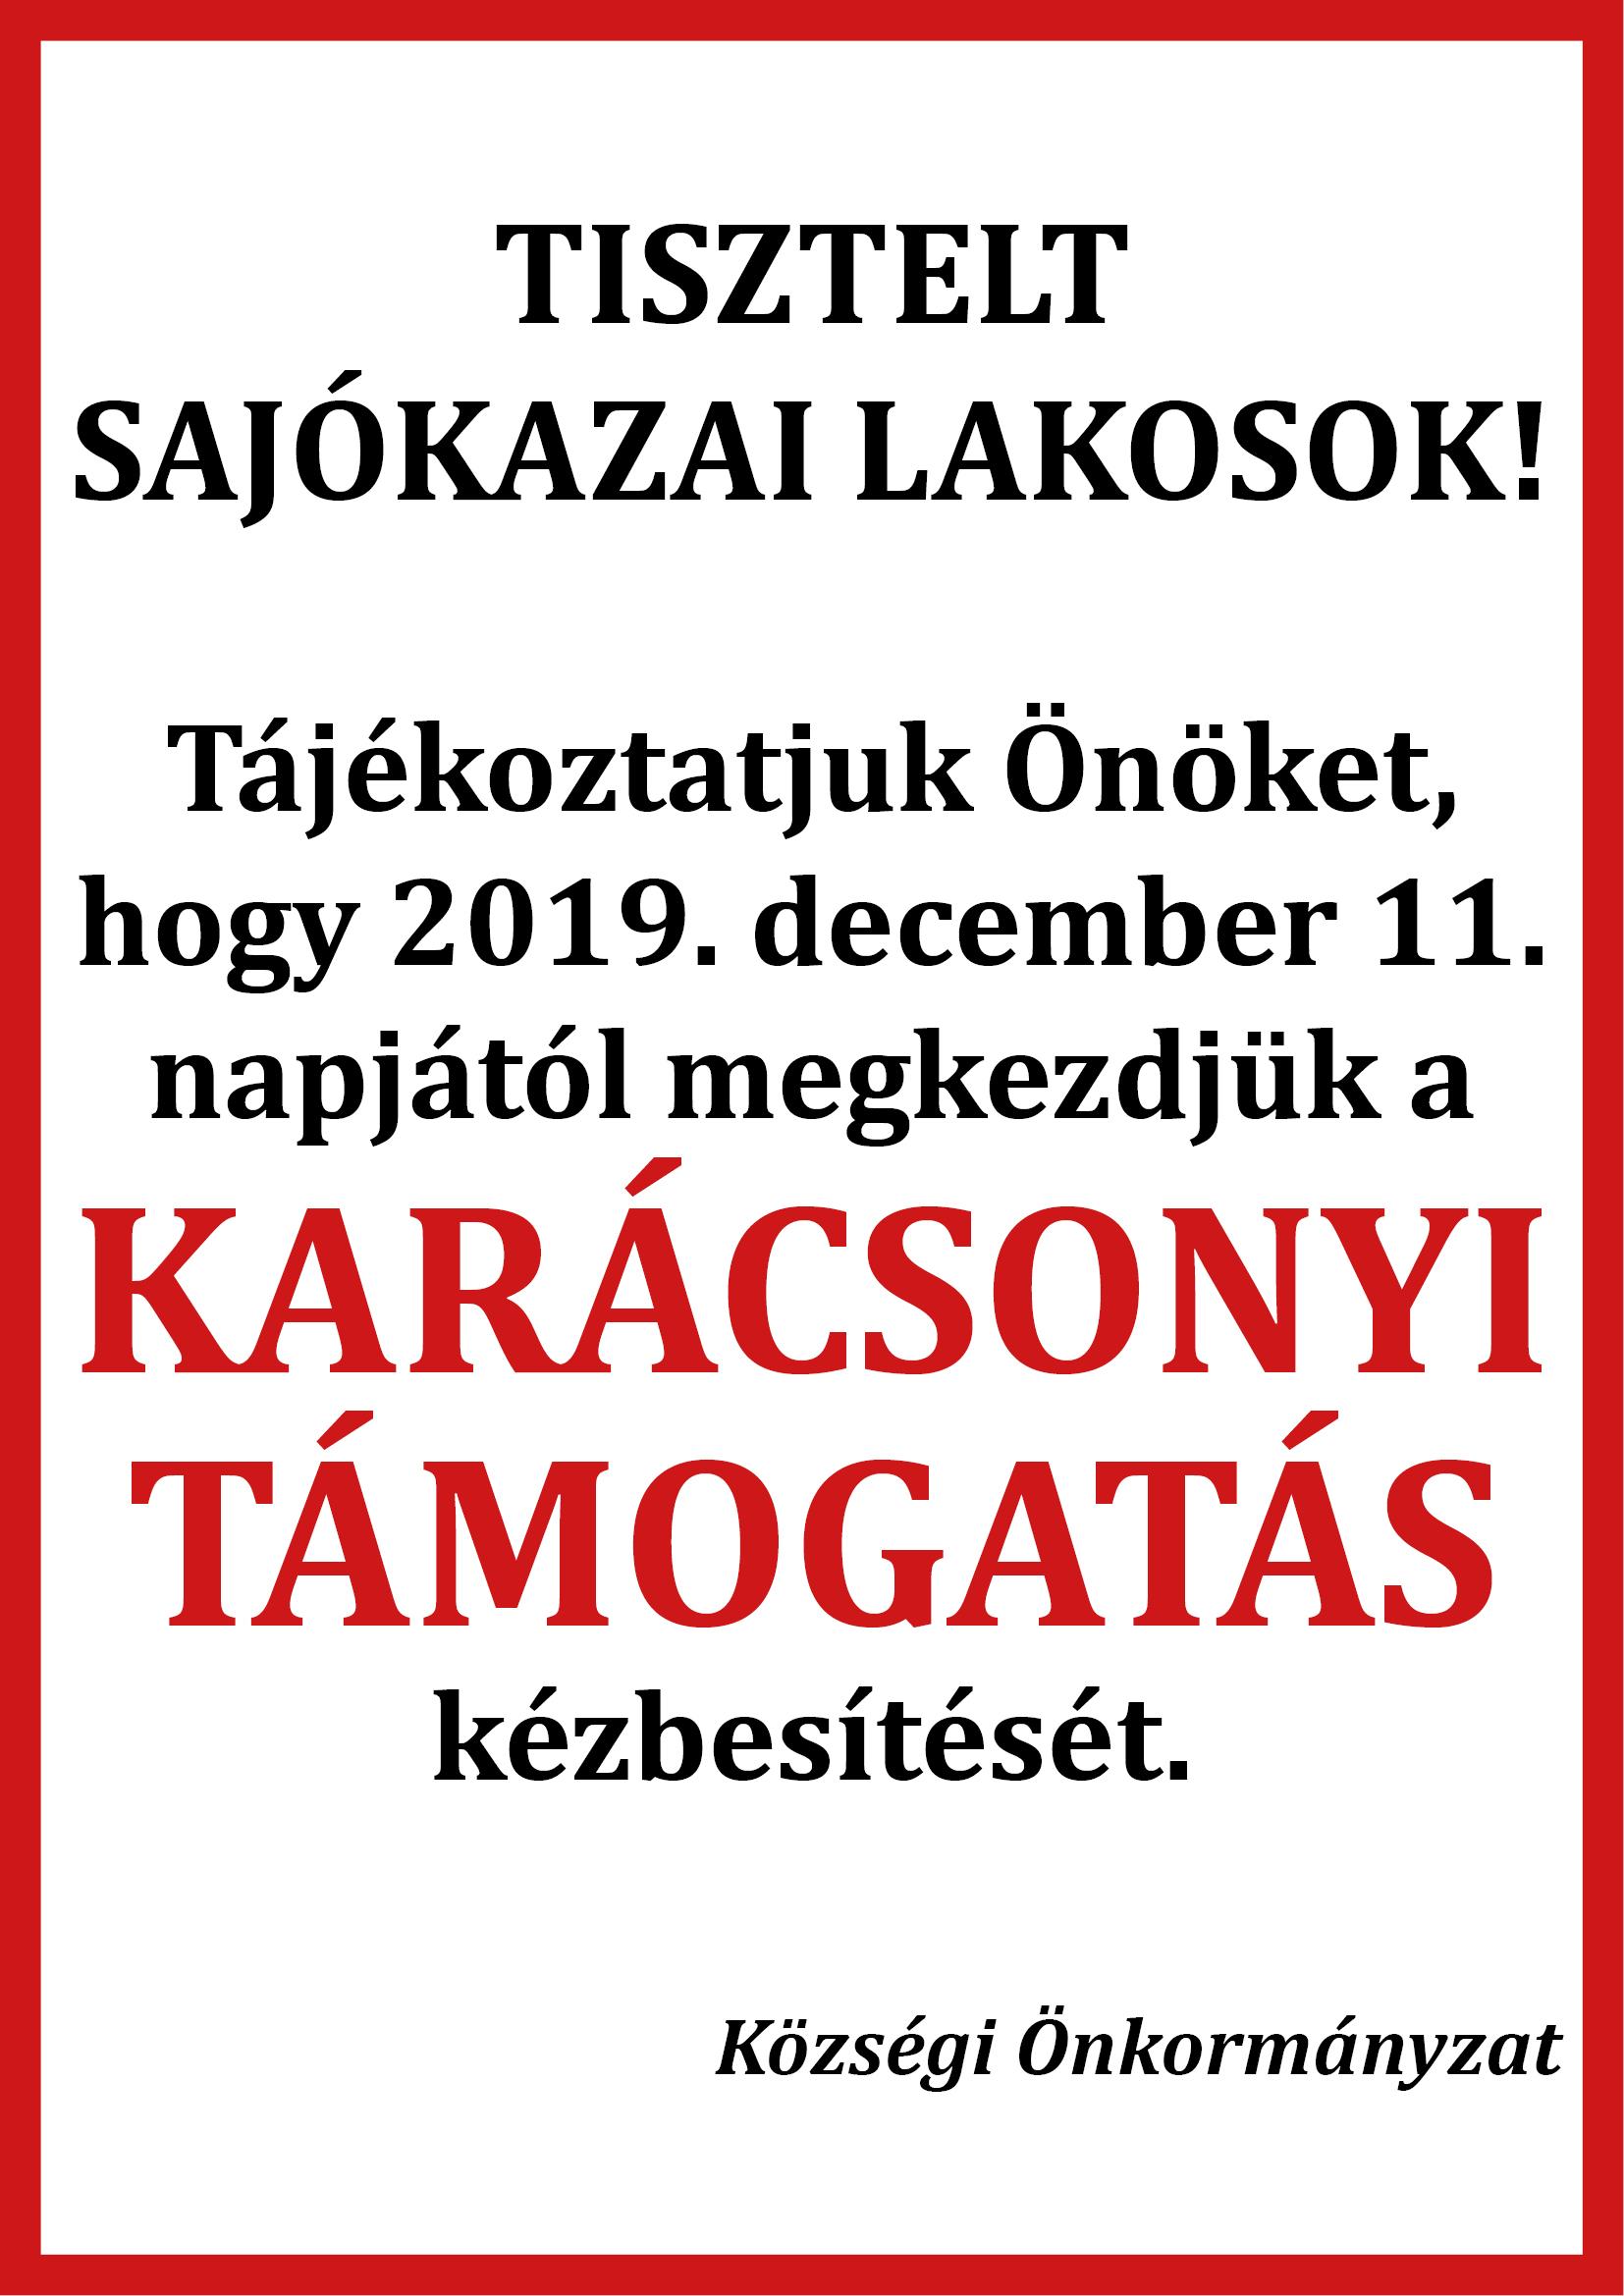 kararcsonyi_tamogatas